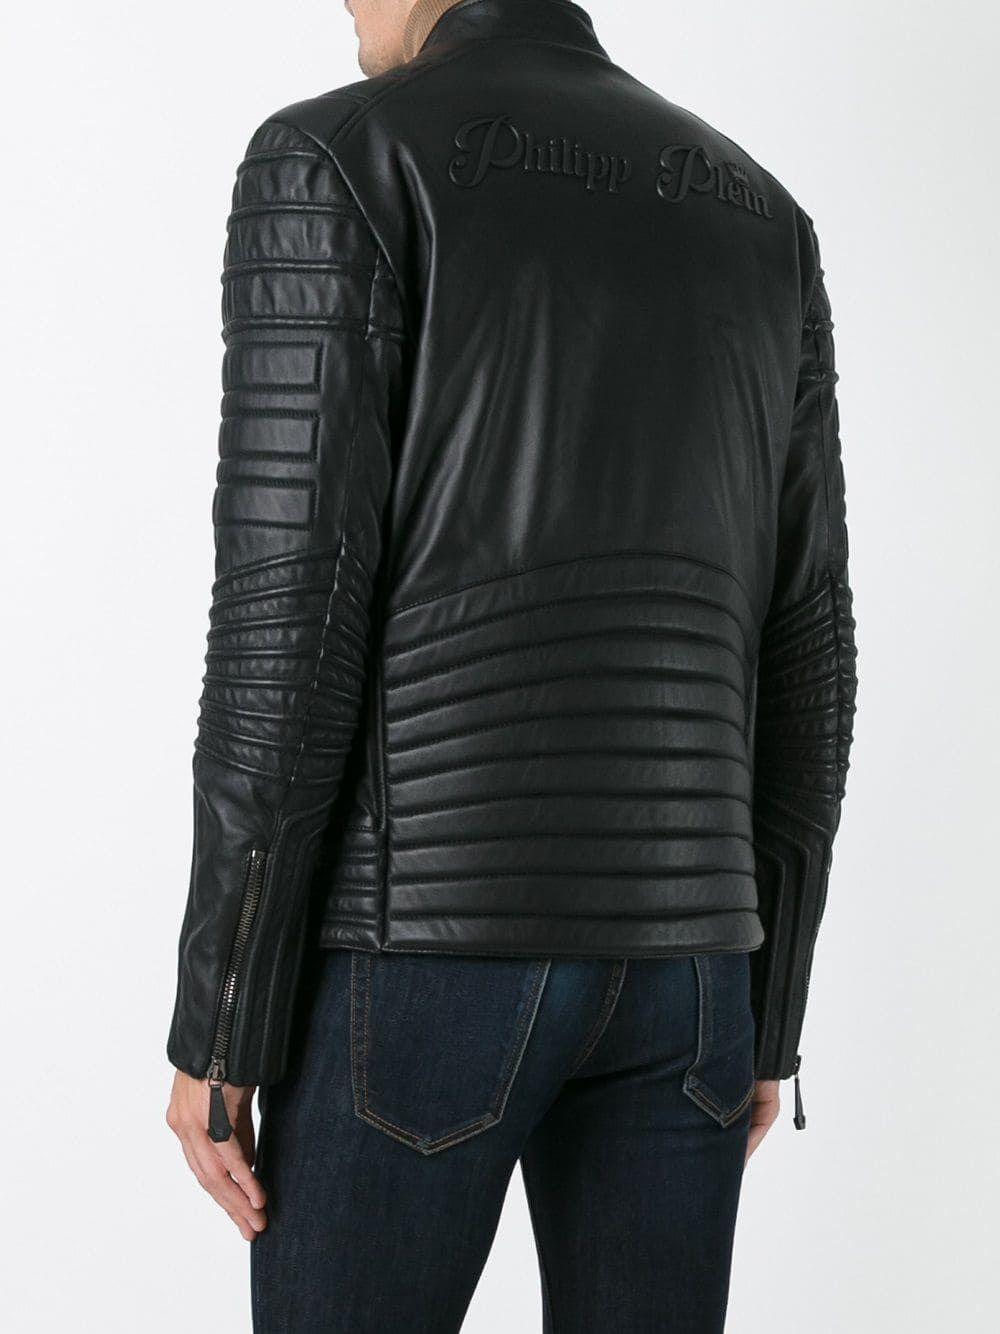 Philipp Plein Ribbed Panel Biker Jacket Biker Jacket Jackets Leather Jacket [ 1334 x 1000 Pixel ]